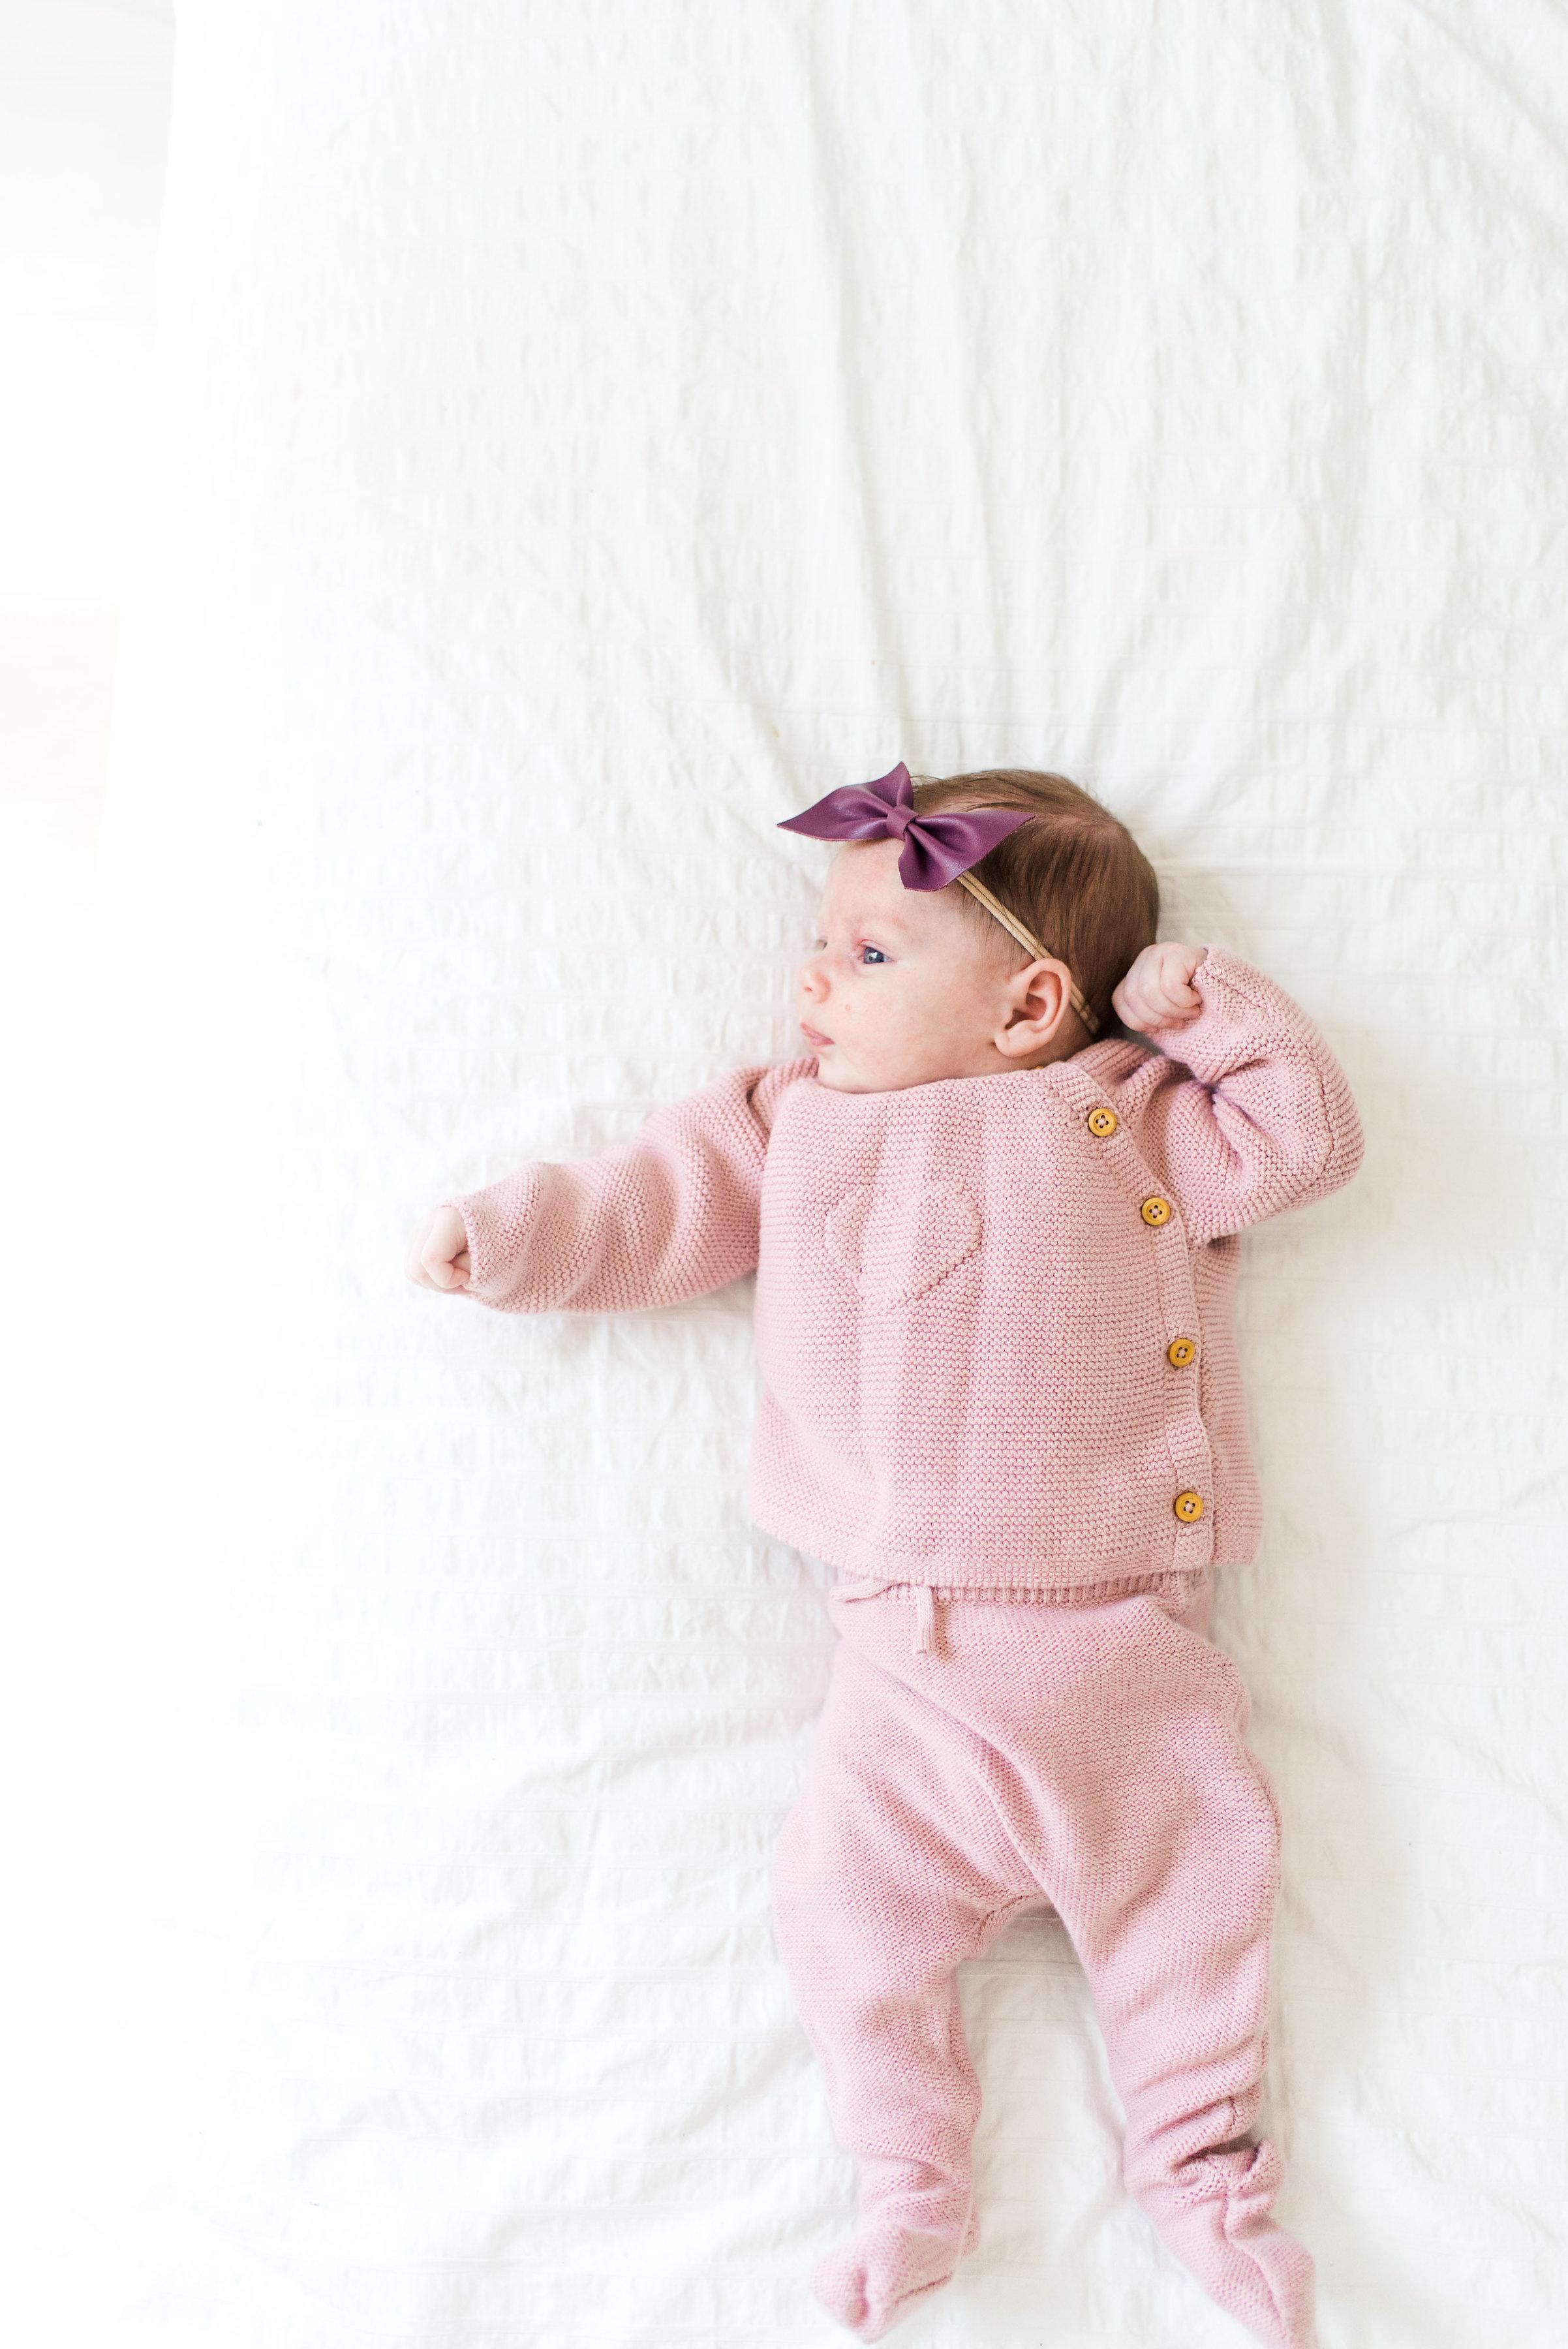 Sweet baby girl basic sweater and leggings: https://www.zara.com/us/en/kids/mini-%7C-0-12-months/knitwear/-c760002p4997572.html